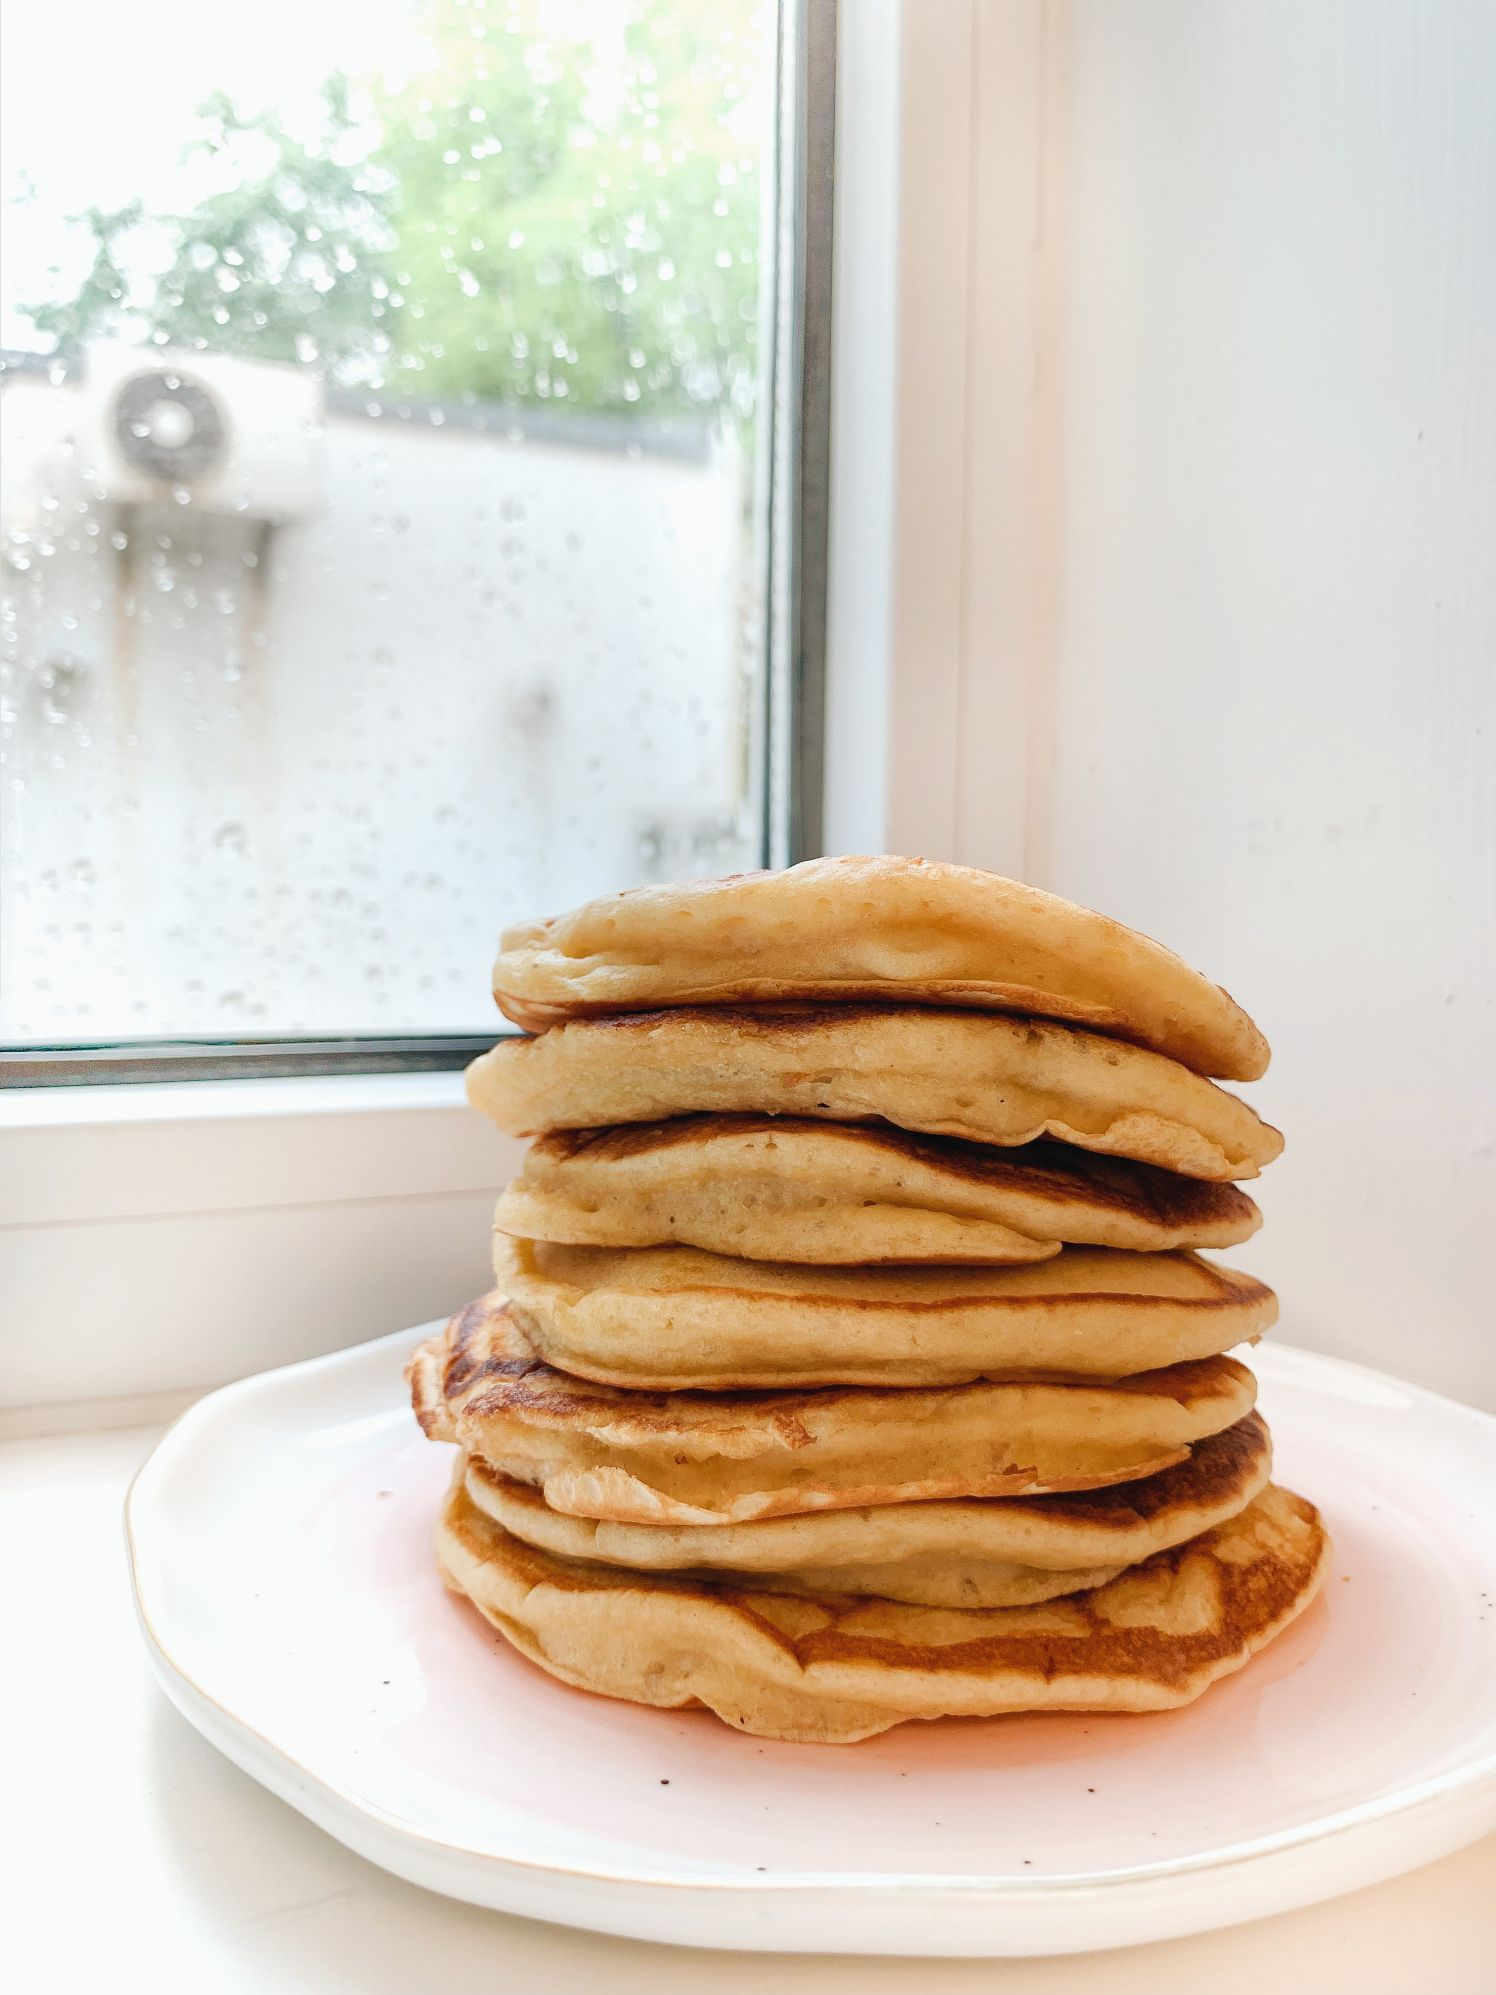 Butterless Fluffy Buttermilk Pancakes For Two Pancakes For Two Buttermilk Pancakes Buttermilk Pancakes Fluffy